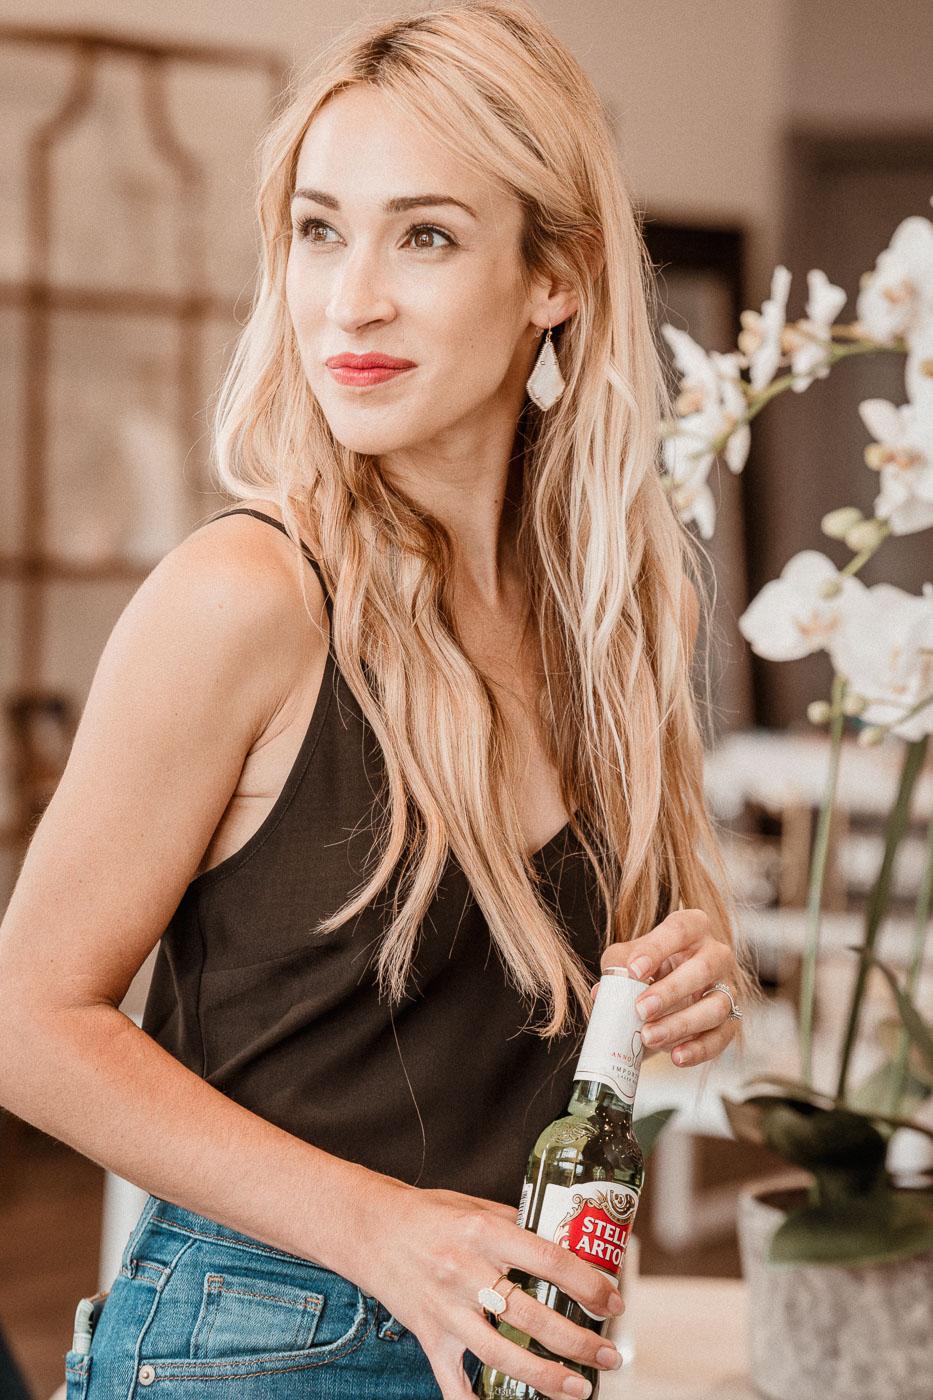 Elyse Ring, Alex Drop Gold Earrings in White Pearl